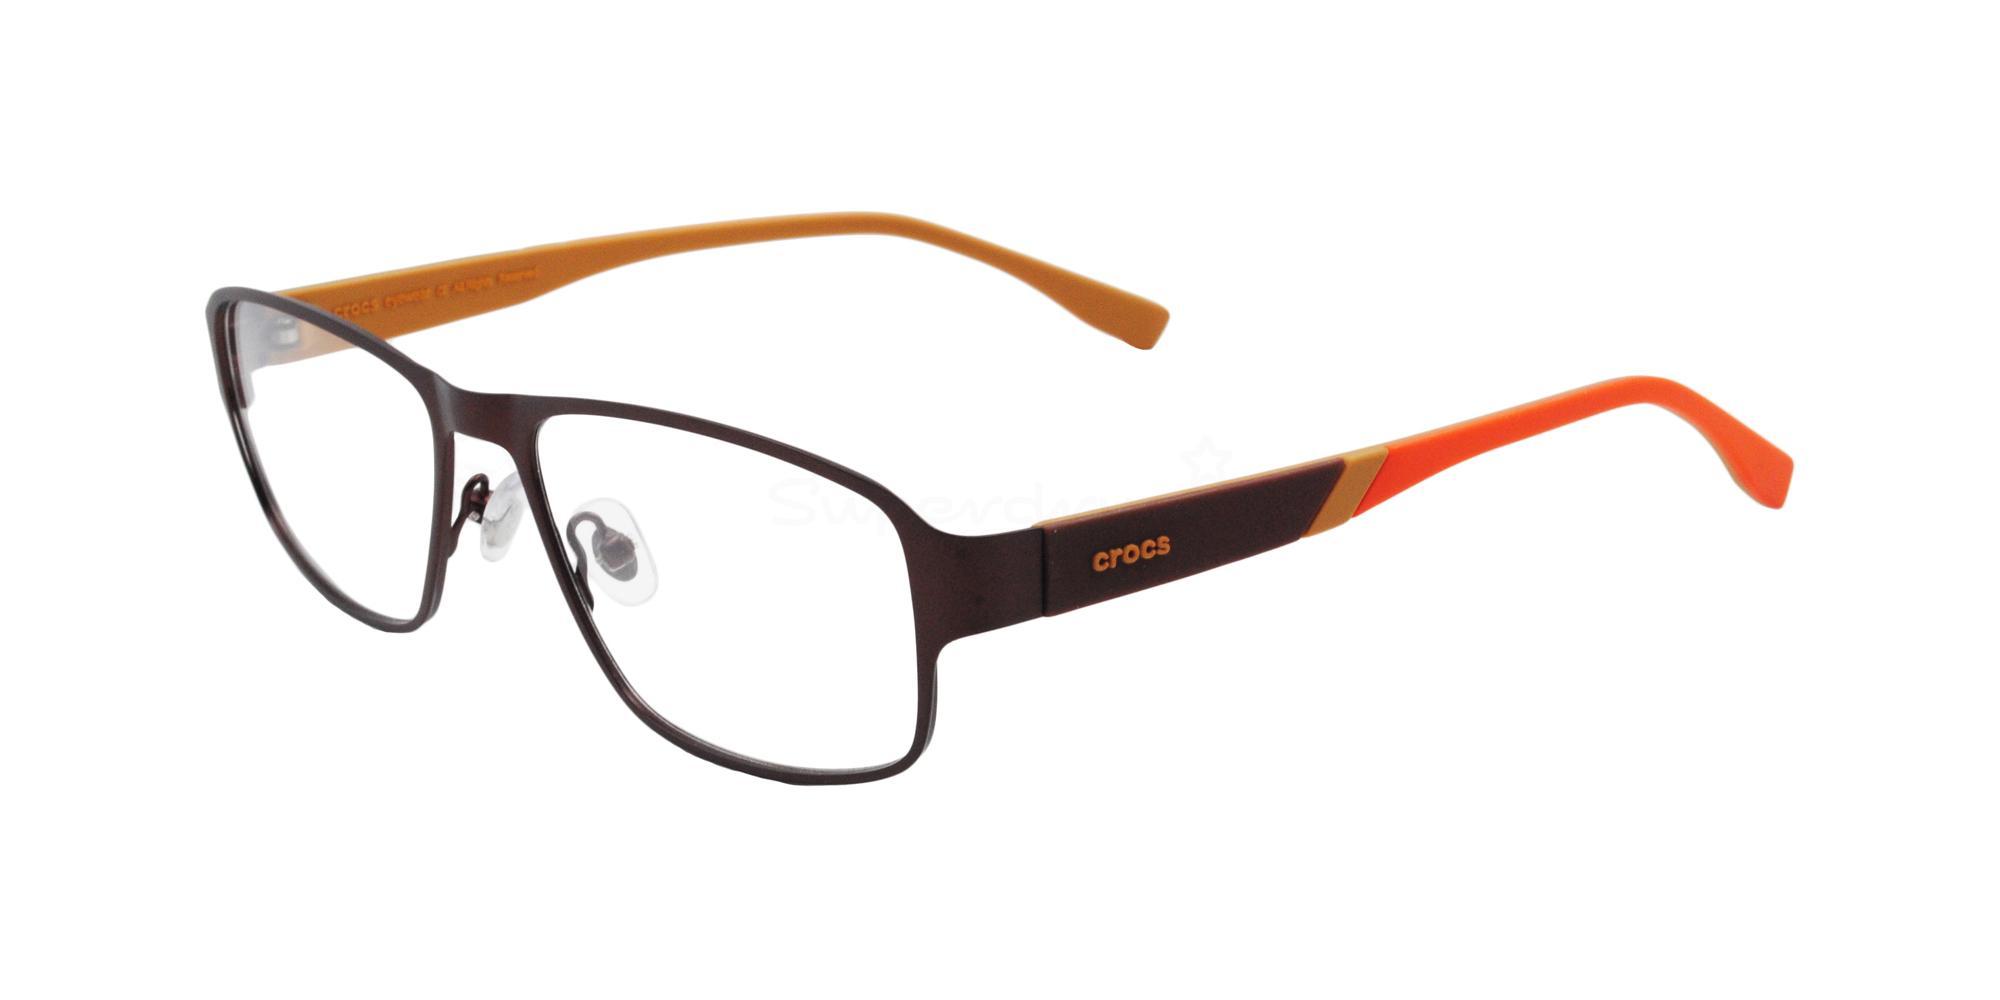 40BN CF3000 Glasses, Crocs Eyewear